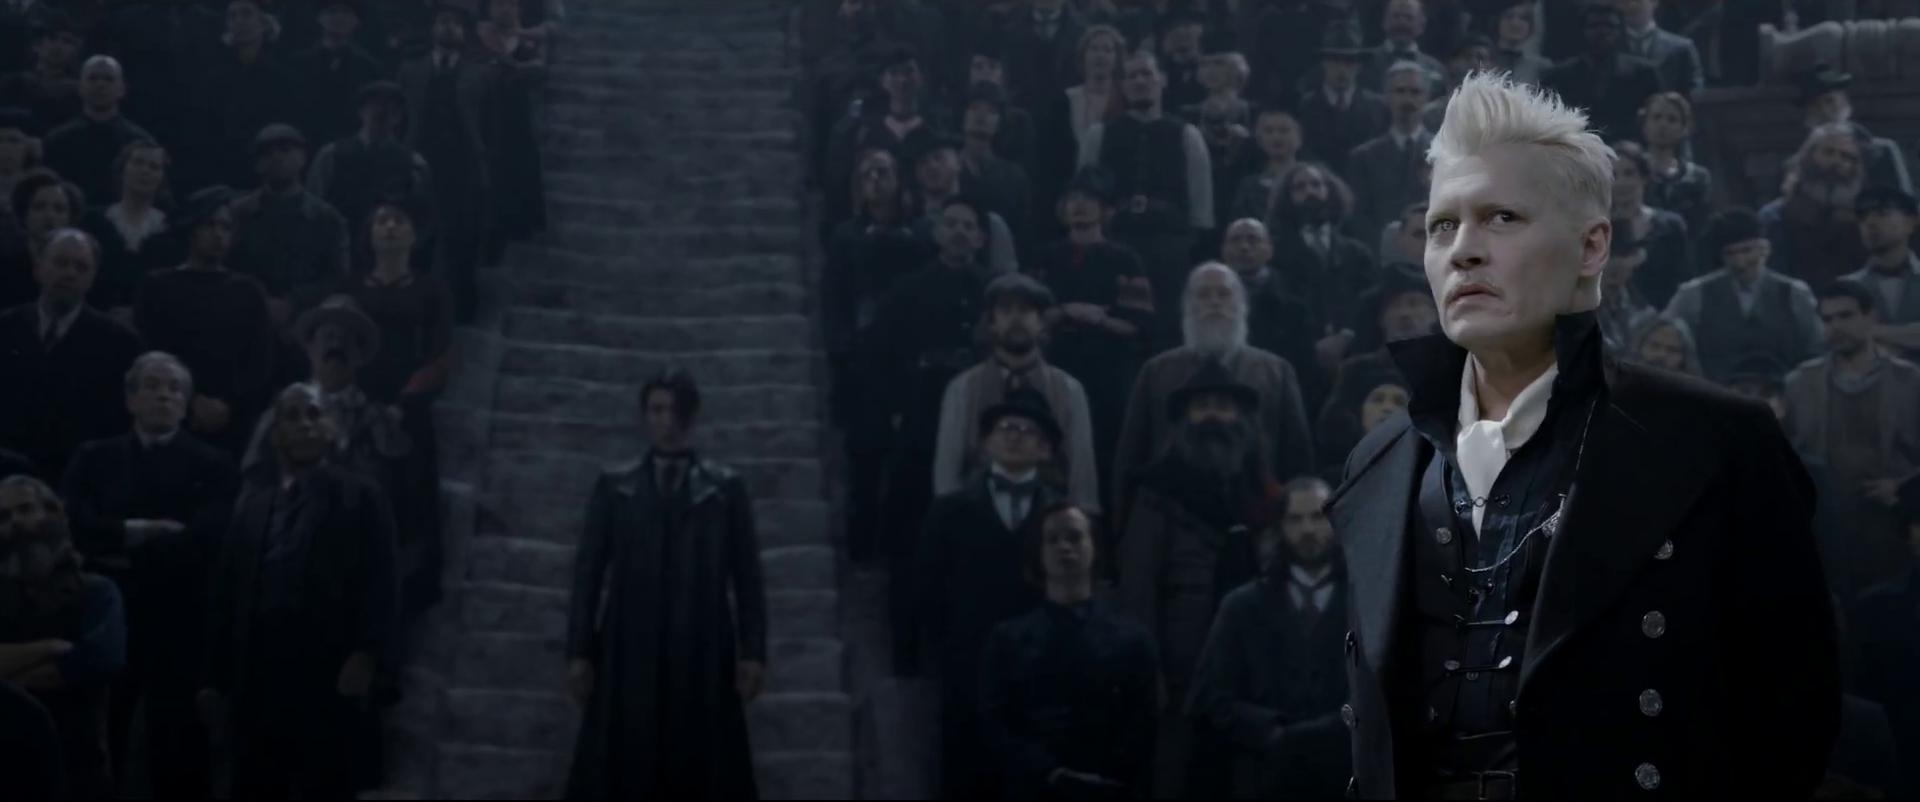 EXCLUSIVE-Fantastic-Beasts-The-Crimes-of-Grindelwald-Grindelwald-s-Vision-94